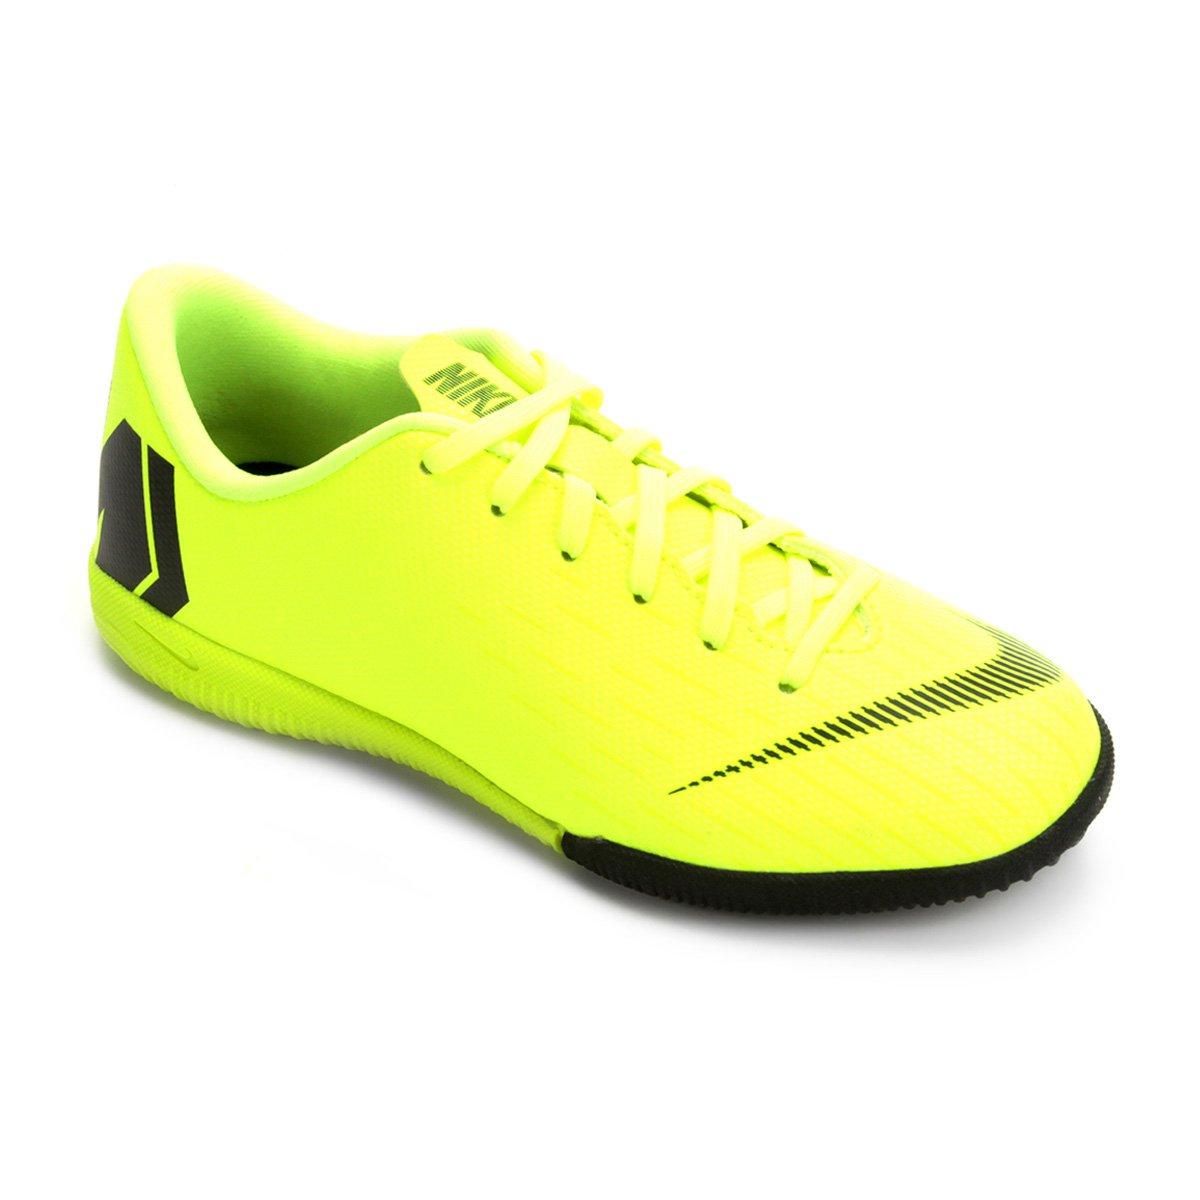 3ae8b05208288 Chuteira Futsal Infantil Nike Mercurial Vapor 12 Academy GS IC. undefined